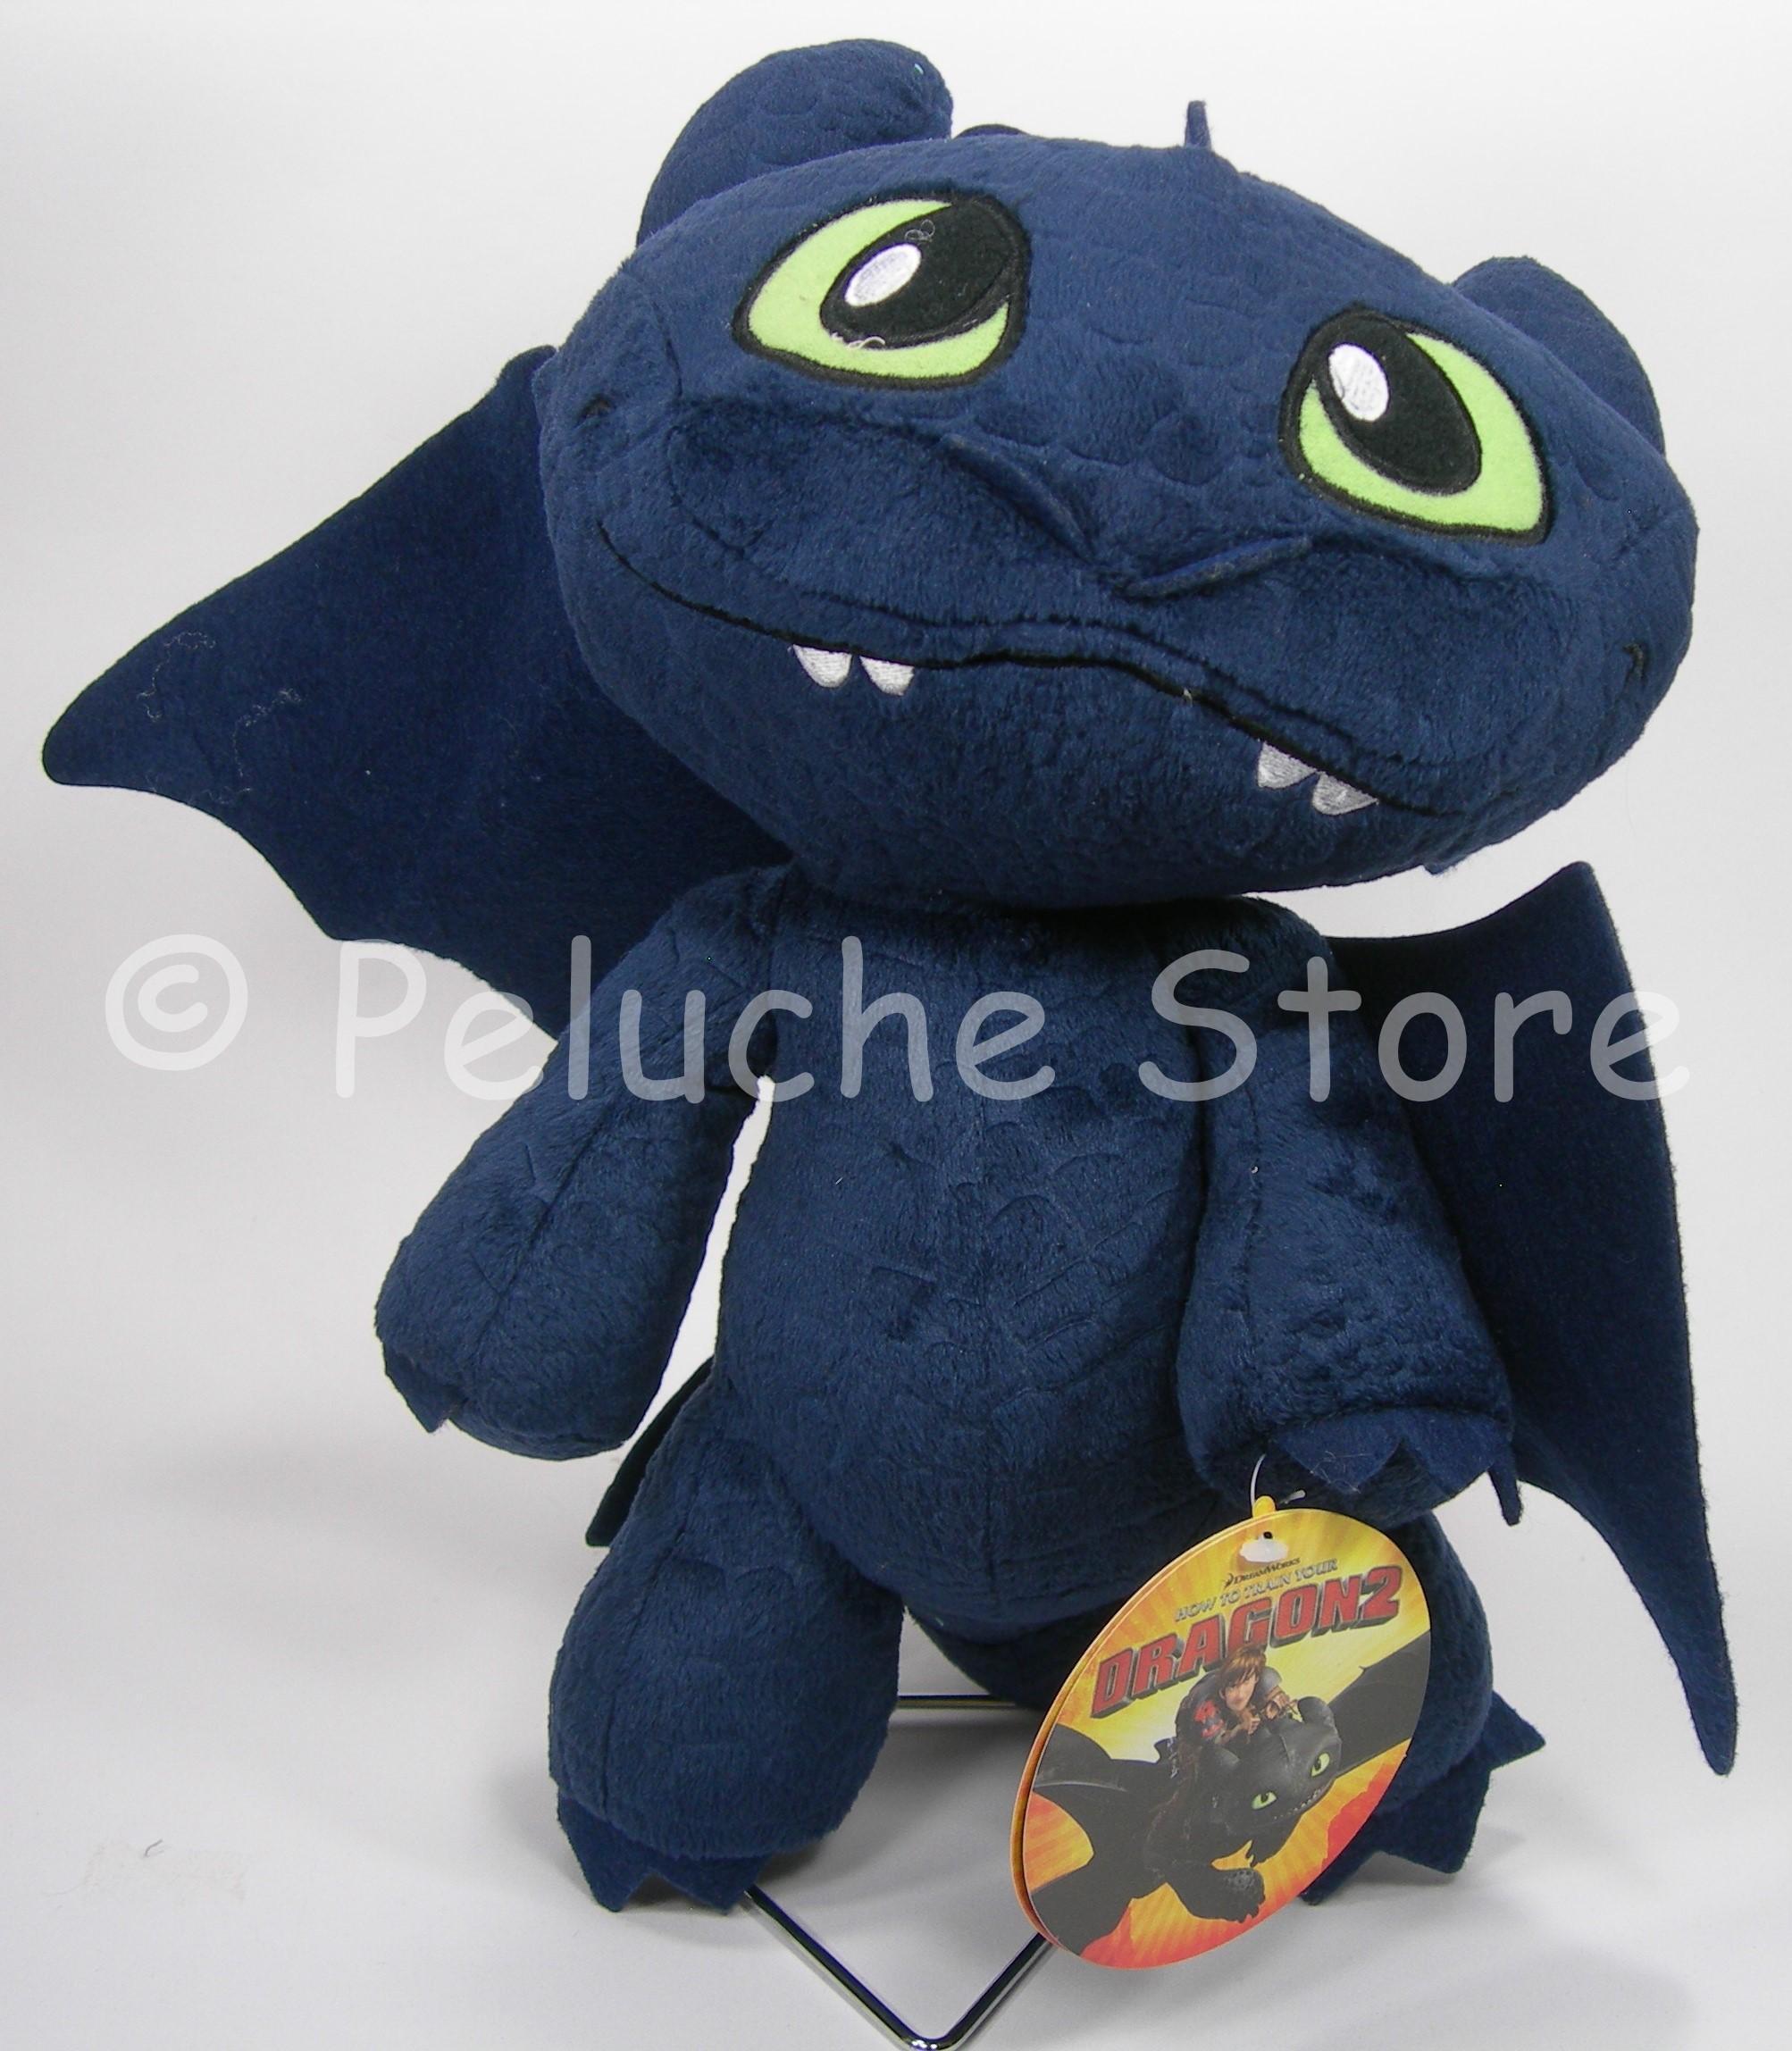 Dragon Trainer 2 peluche 30 cm Toothless Furia Buia Tagliatempeste Zannacurva